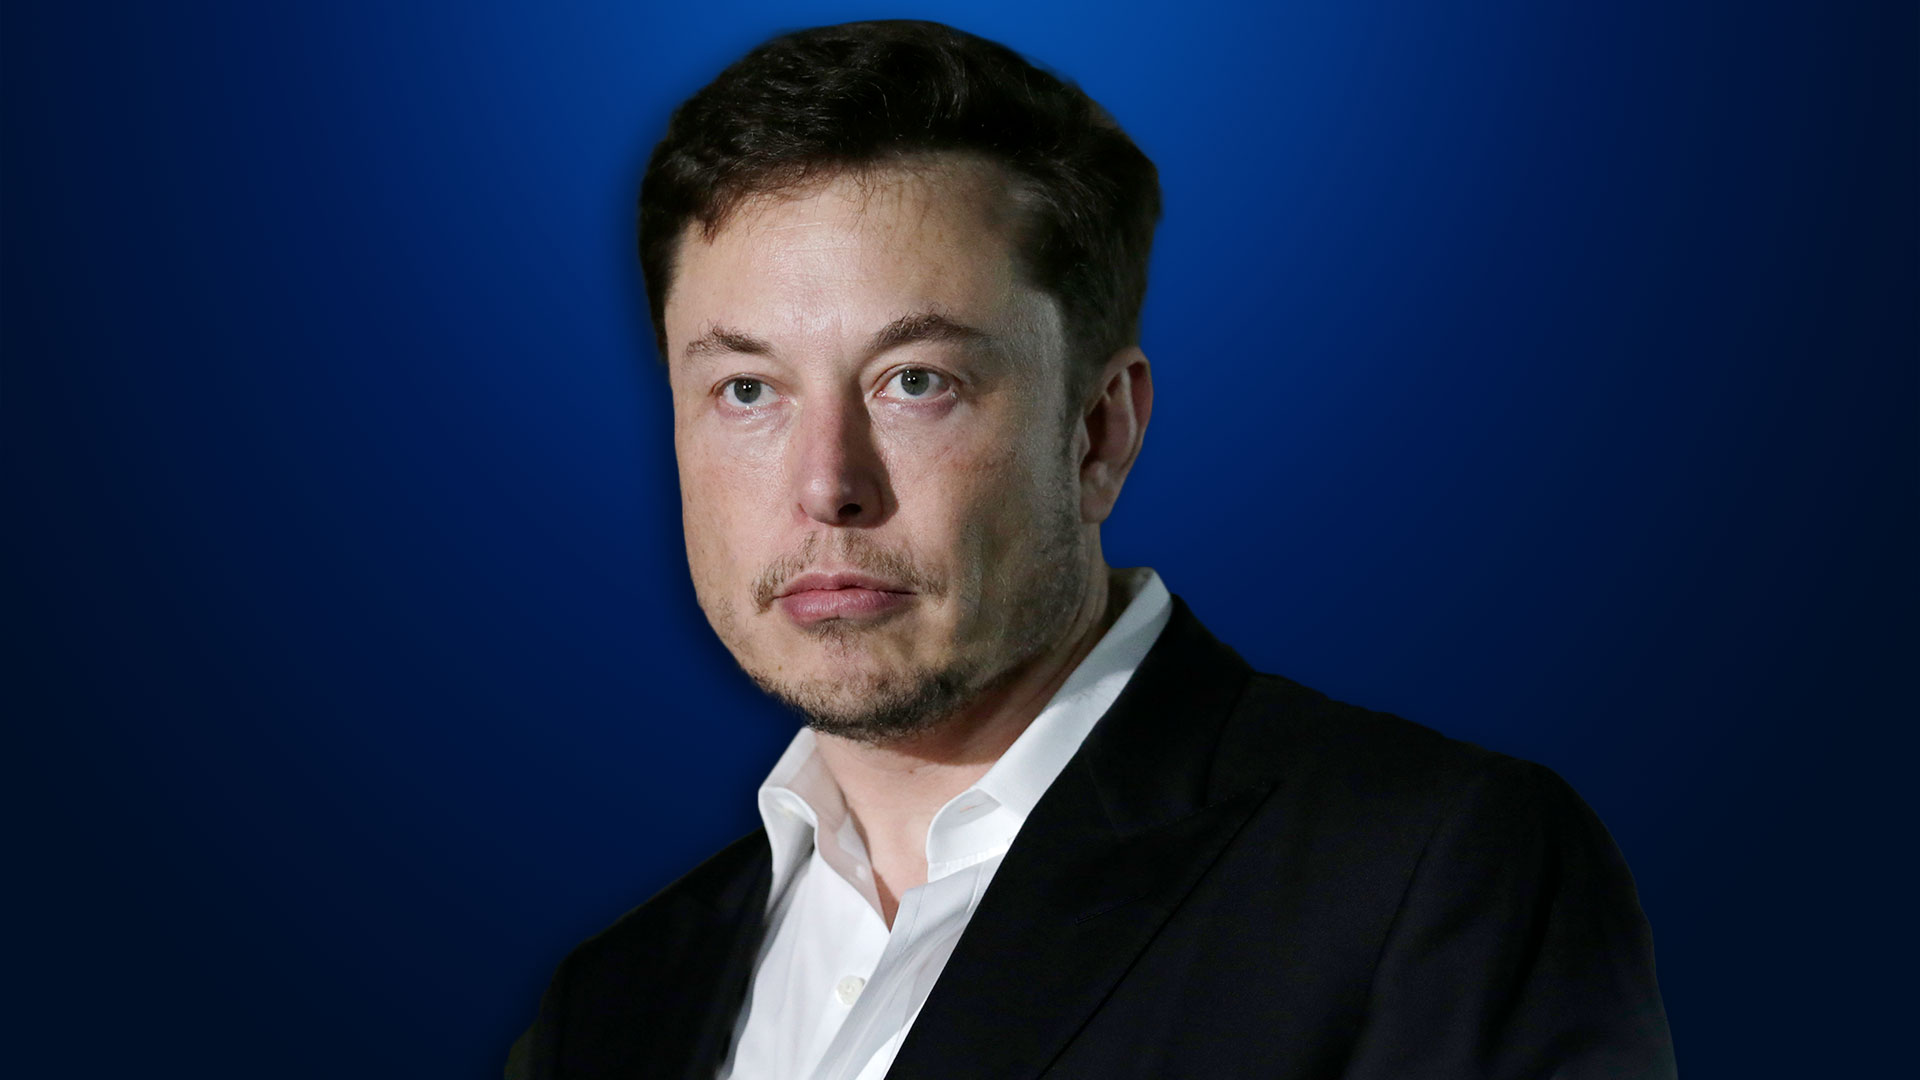 KELO Elon Musk